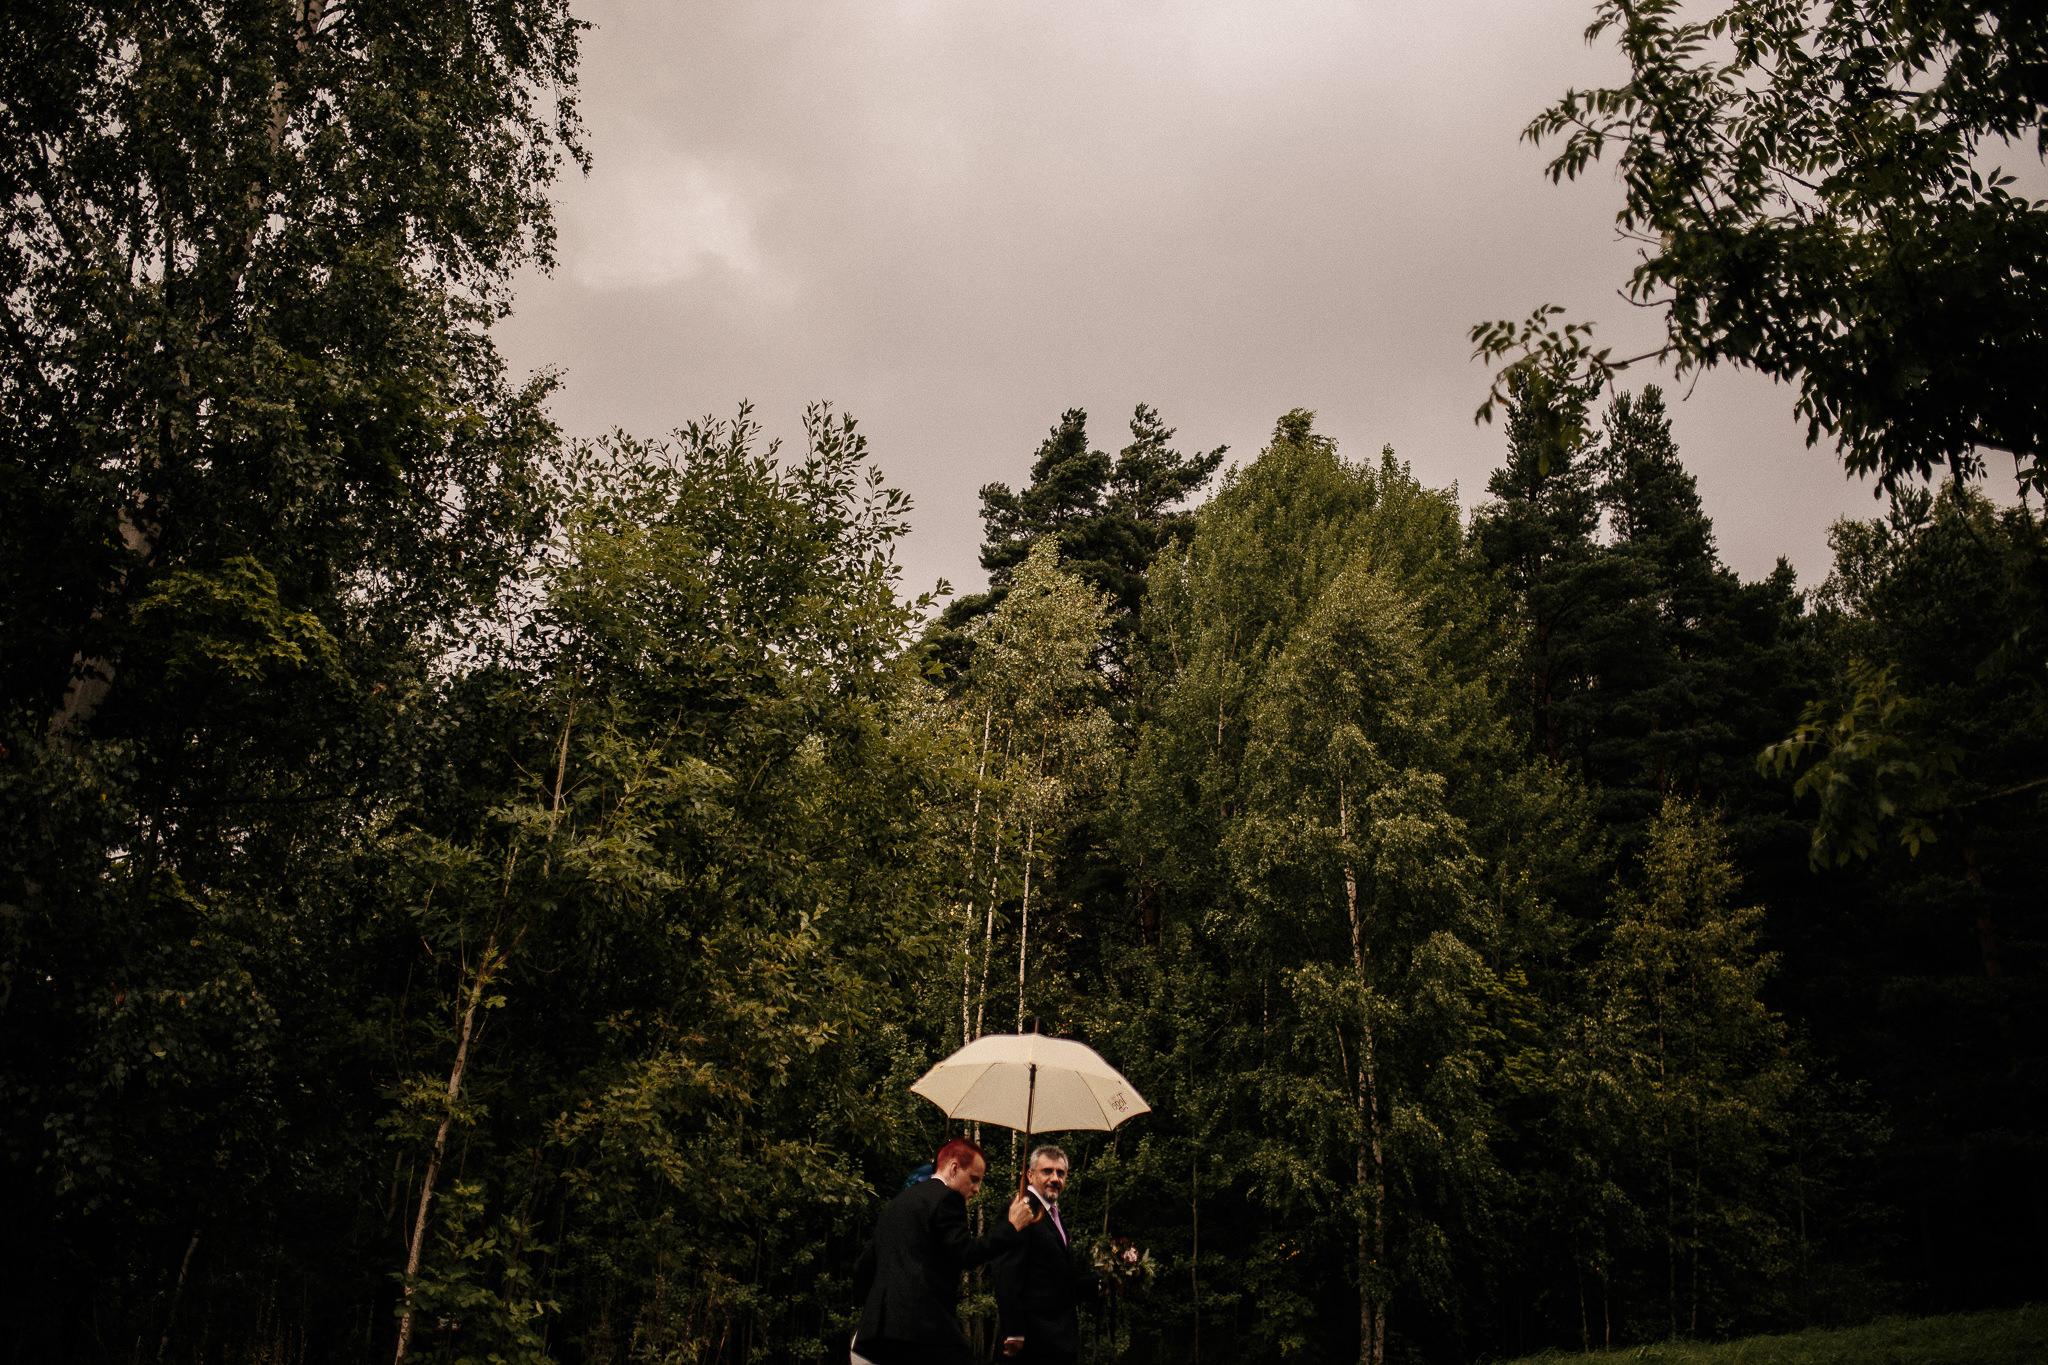 Ceren & Jani - Finland Wedding Photographer - Weddings by Qay - Wedding Photographer (90 of 166).jpg